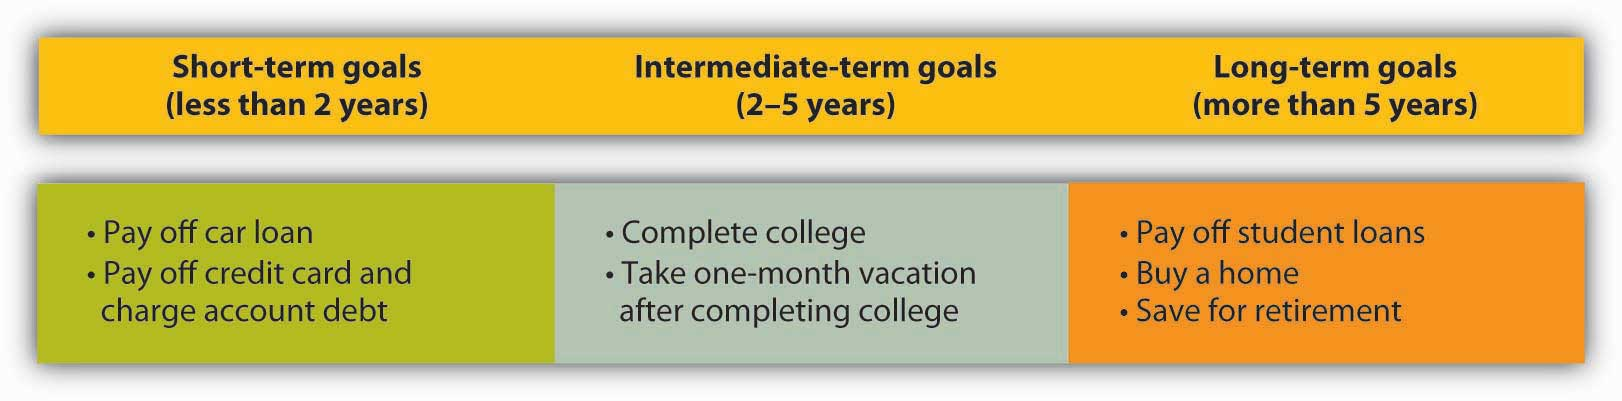 Essay On Longterm Goals Educationshort term and long term goals mba